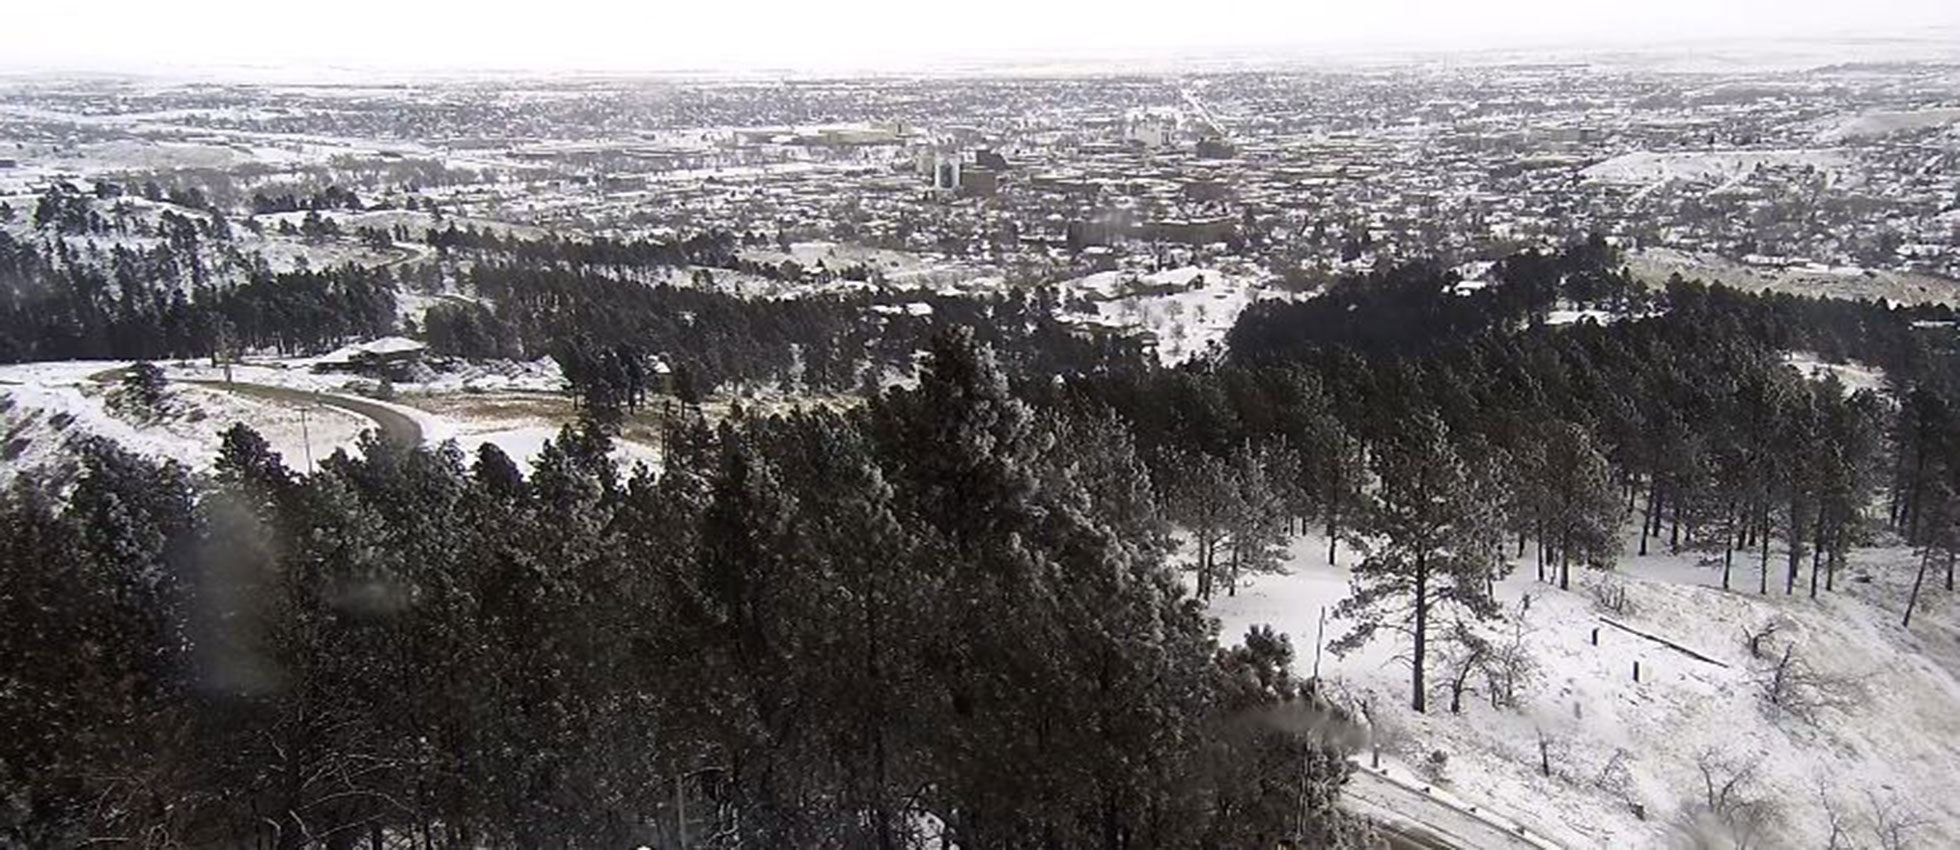 Rapid City Skycam